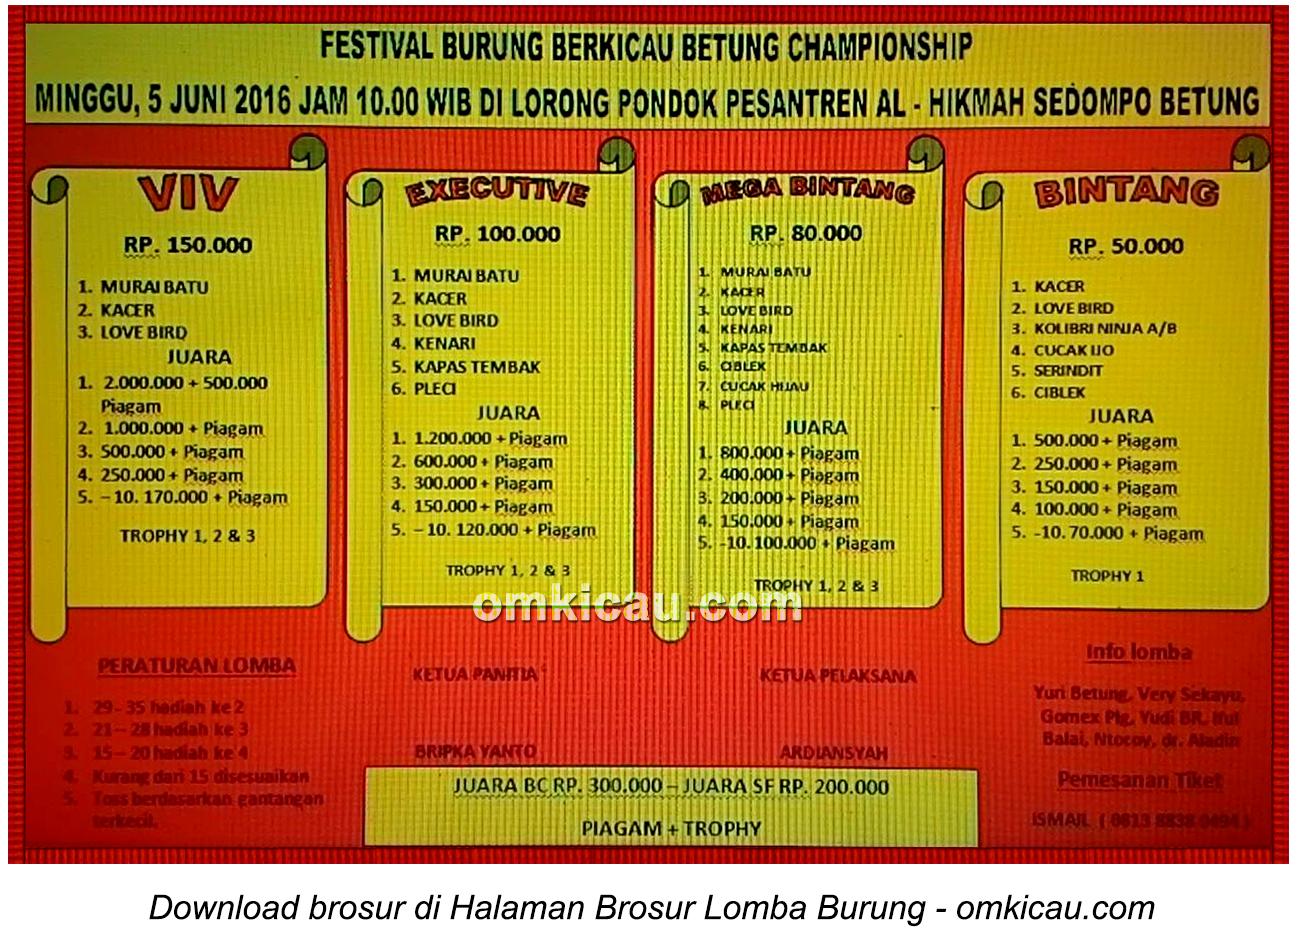 Brosur Festival Burung Berkicau Betung Championship, Betung, 5 Juni 2016